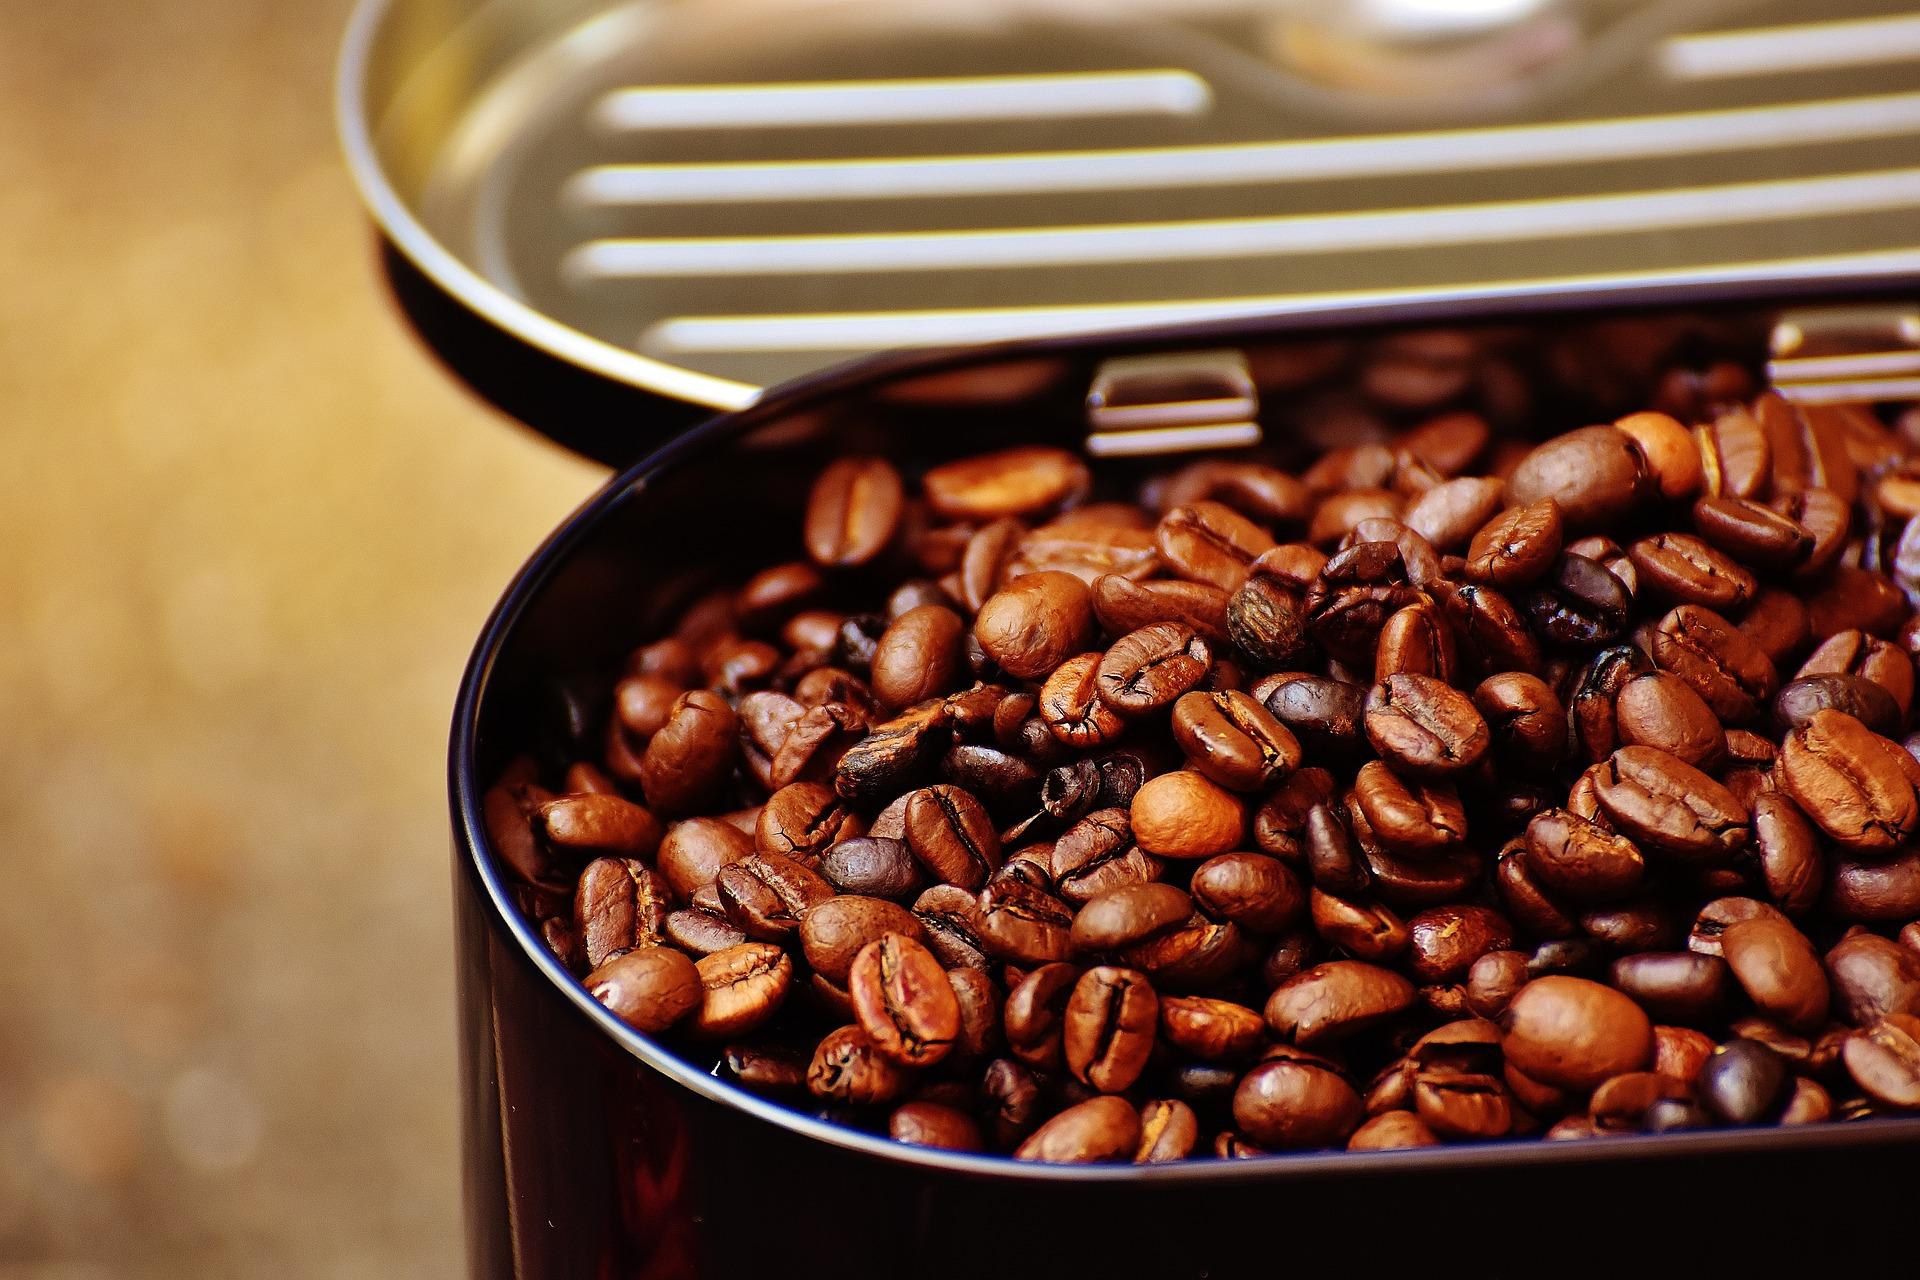 sa bei cafea zilnic - sfatulparintilor.ro - pixabay_com - coffee-tin-1705026_1920